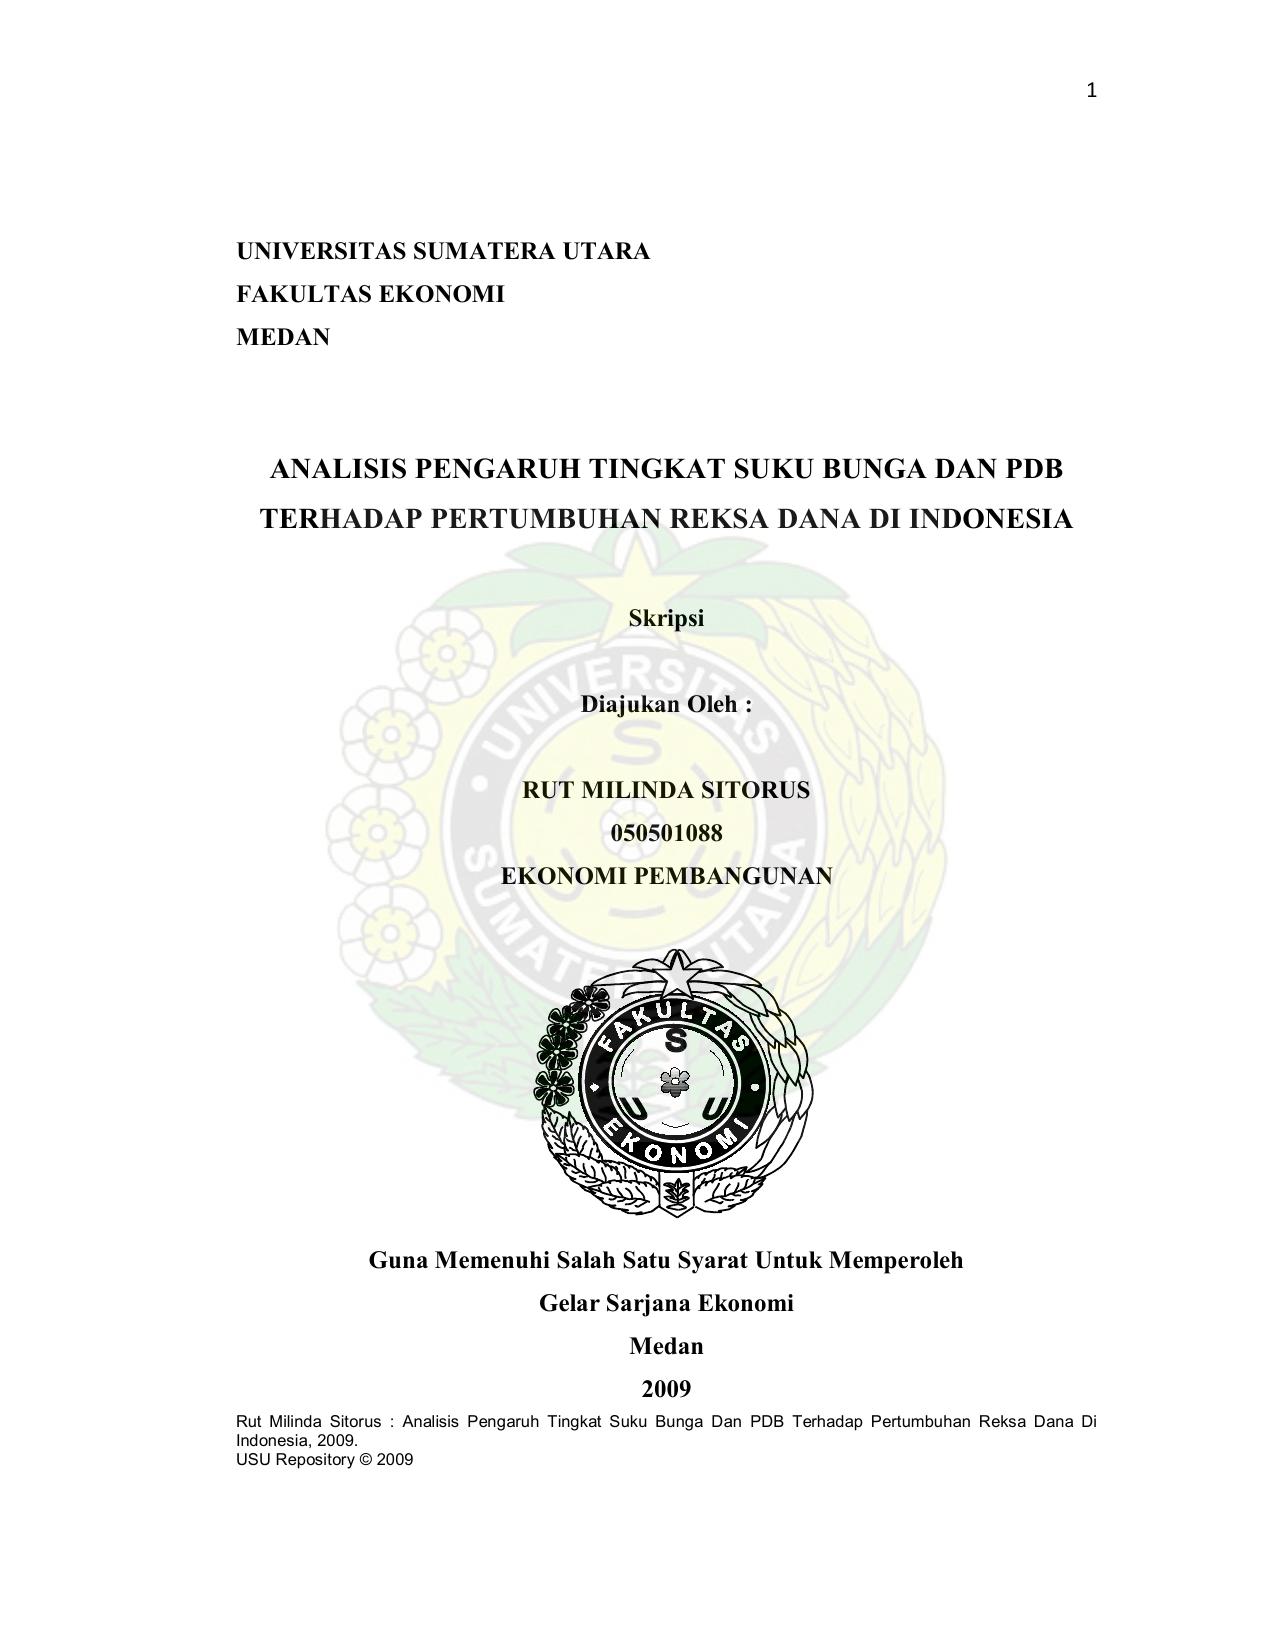 Analisis Pengaruh Tingkat Suku Bunga Dan Pdb